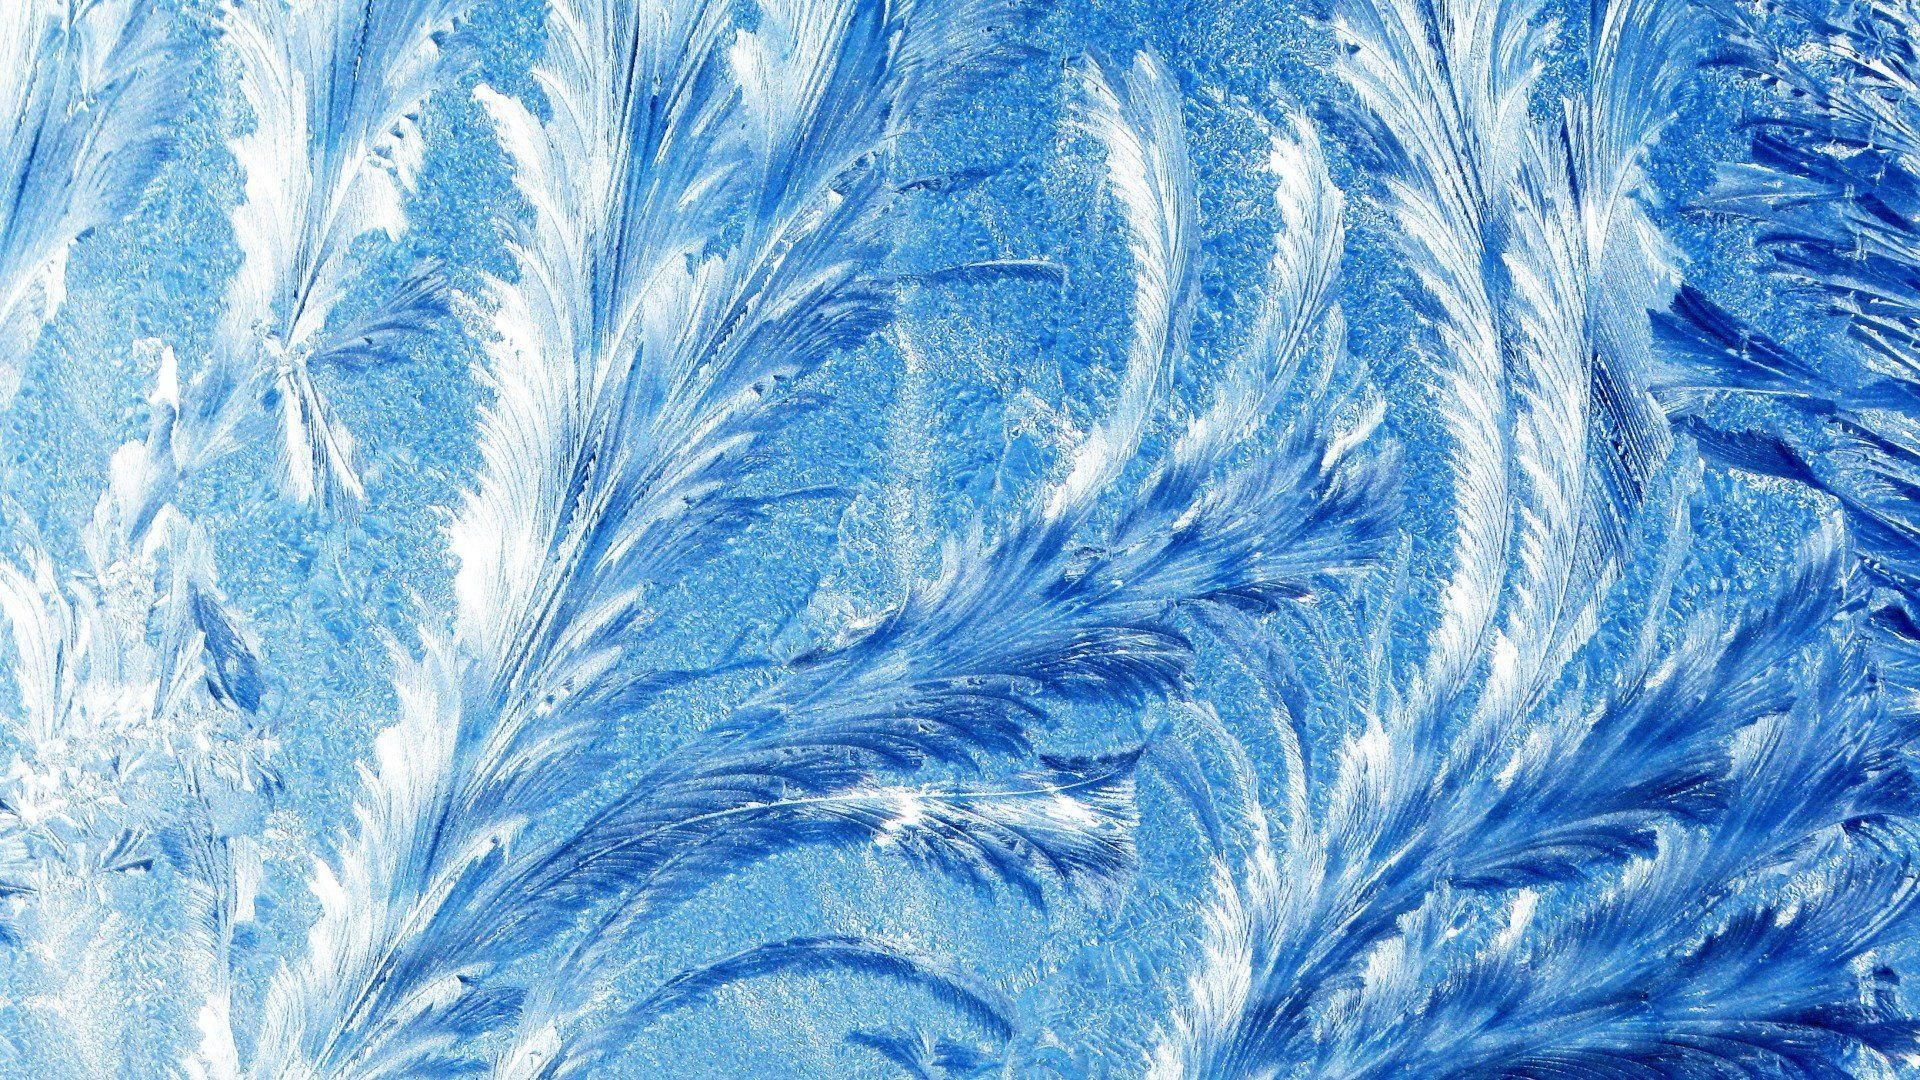 Winter Patterns On The Window Wallpaper Theme